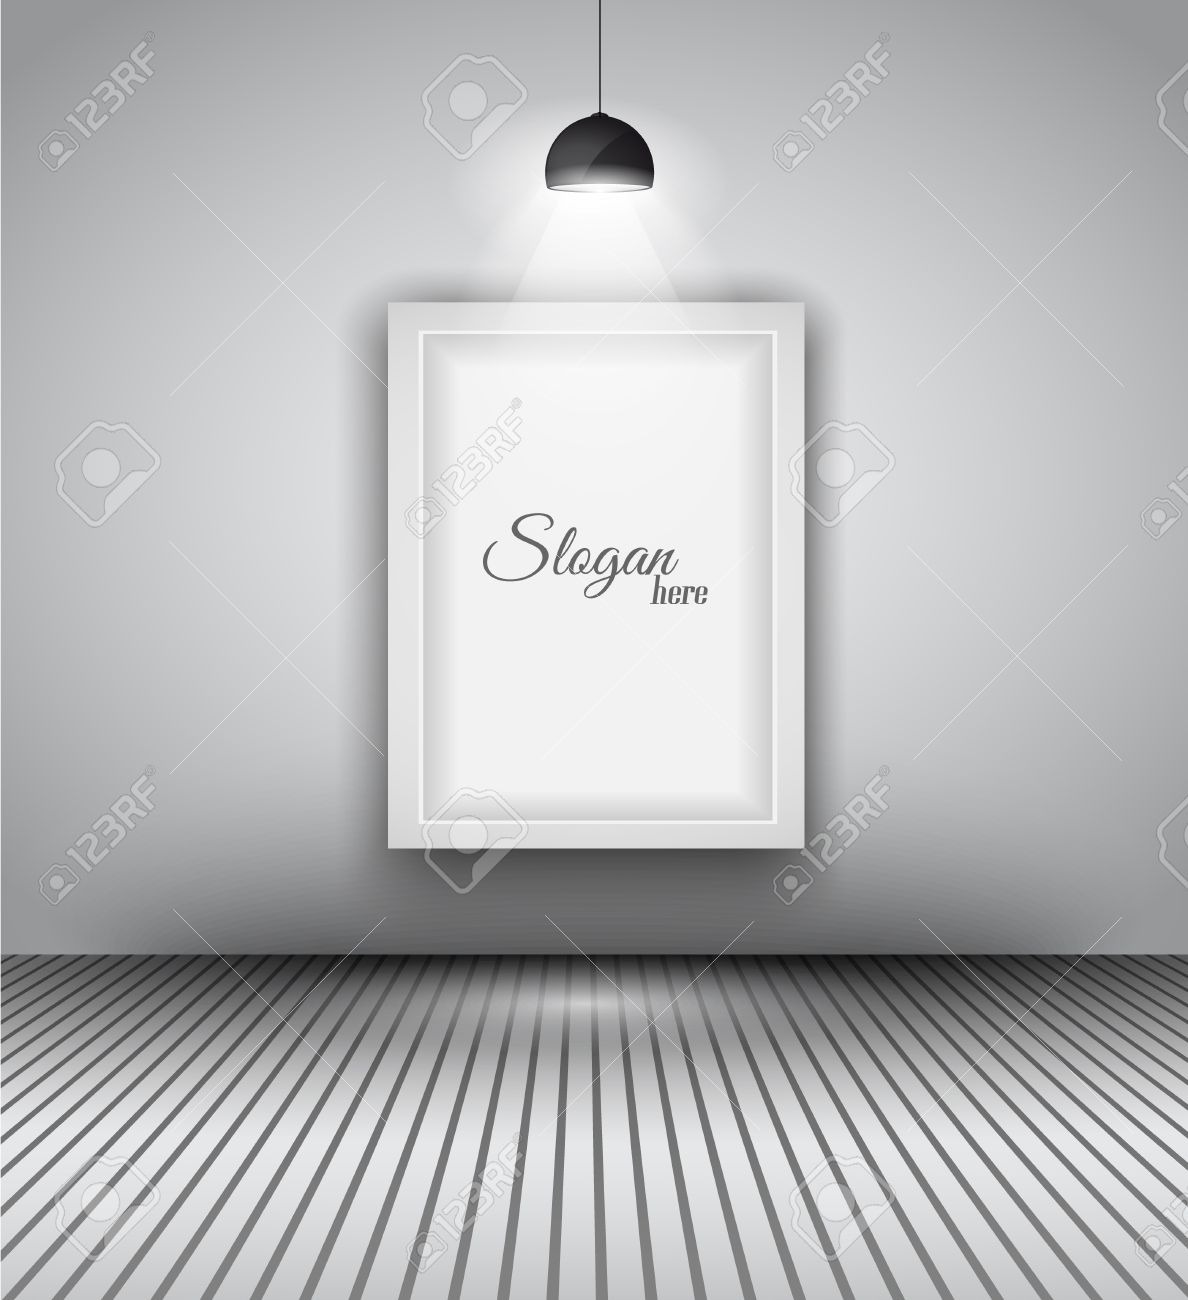 Modern Interior Art Gallery Frame Design With Spotlights. Shelf, Spotlight  With Directional Light,